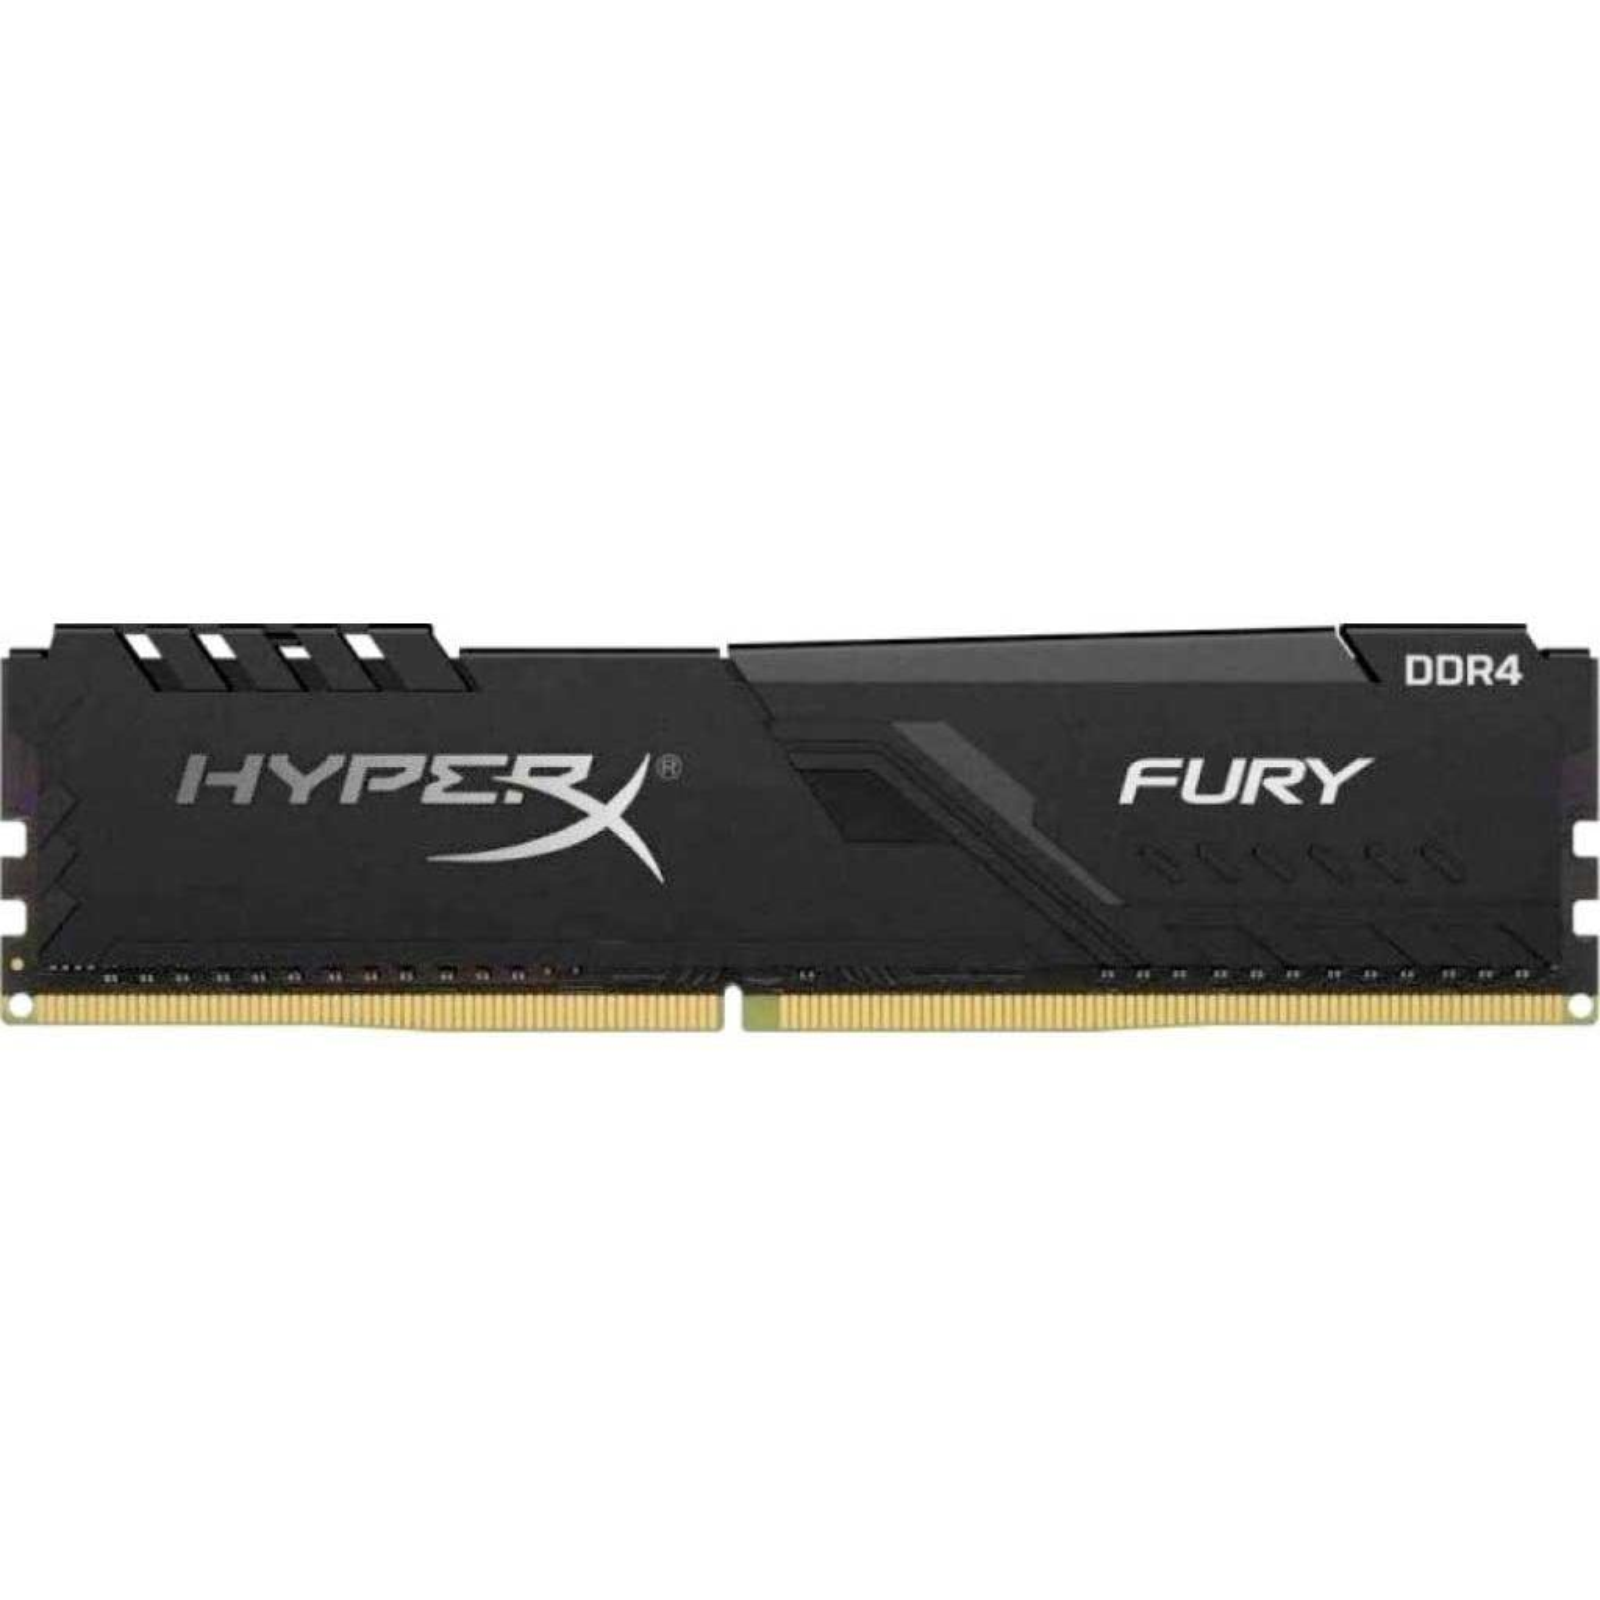 Модуль памяти для компьютера DDR4 16GB 2400 MHz HyperX FURY Black HyperX (Kingston Fury) (HX424C15FB3/16)